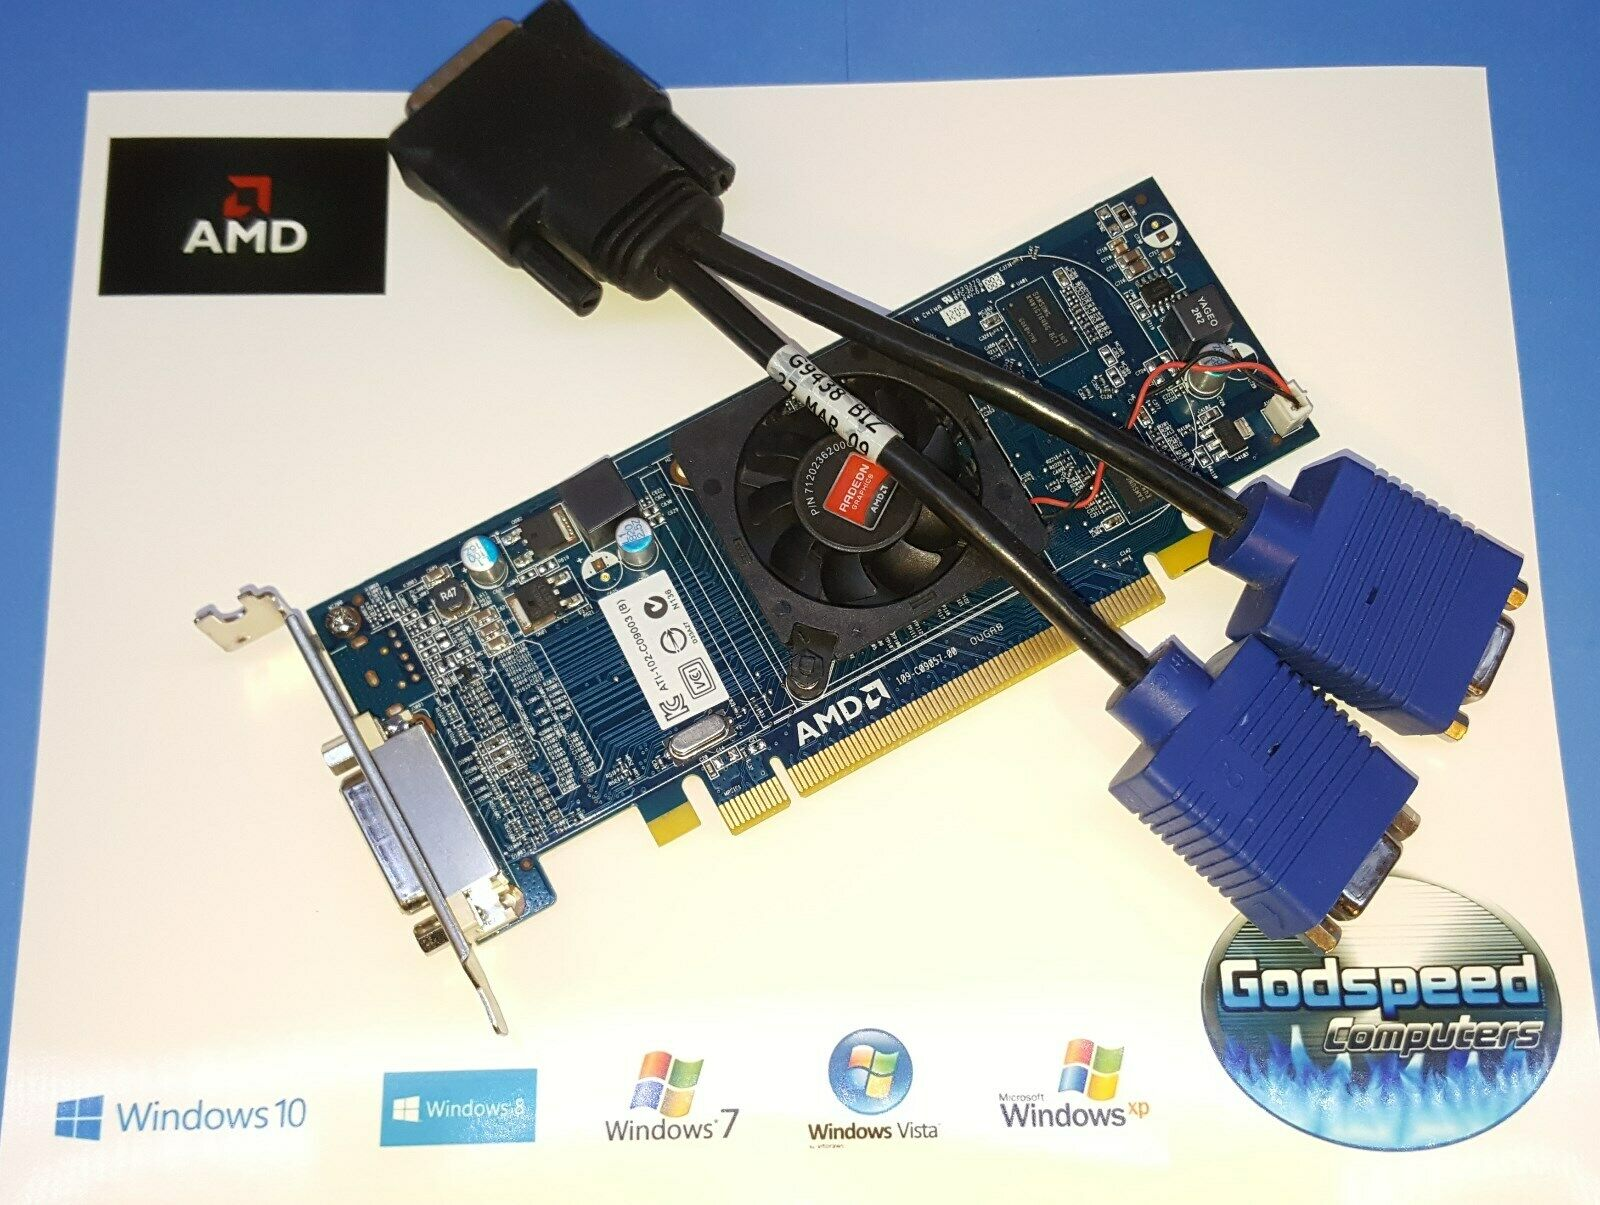 HP Pavilion s5380t s5412p s5414y s5501f HD SFF Dual Display VGA Video Card